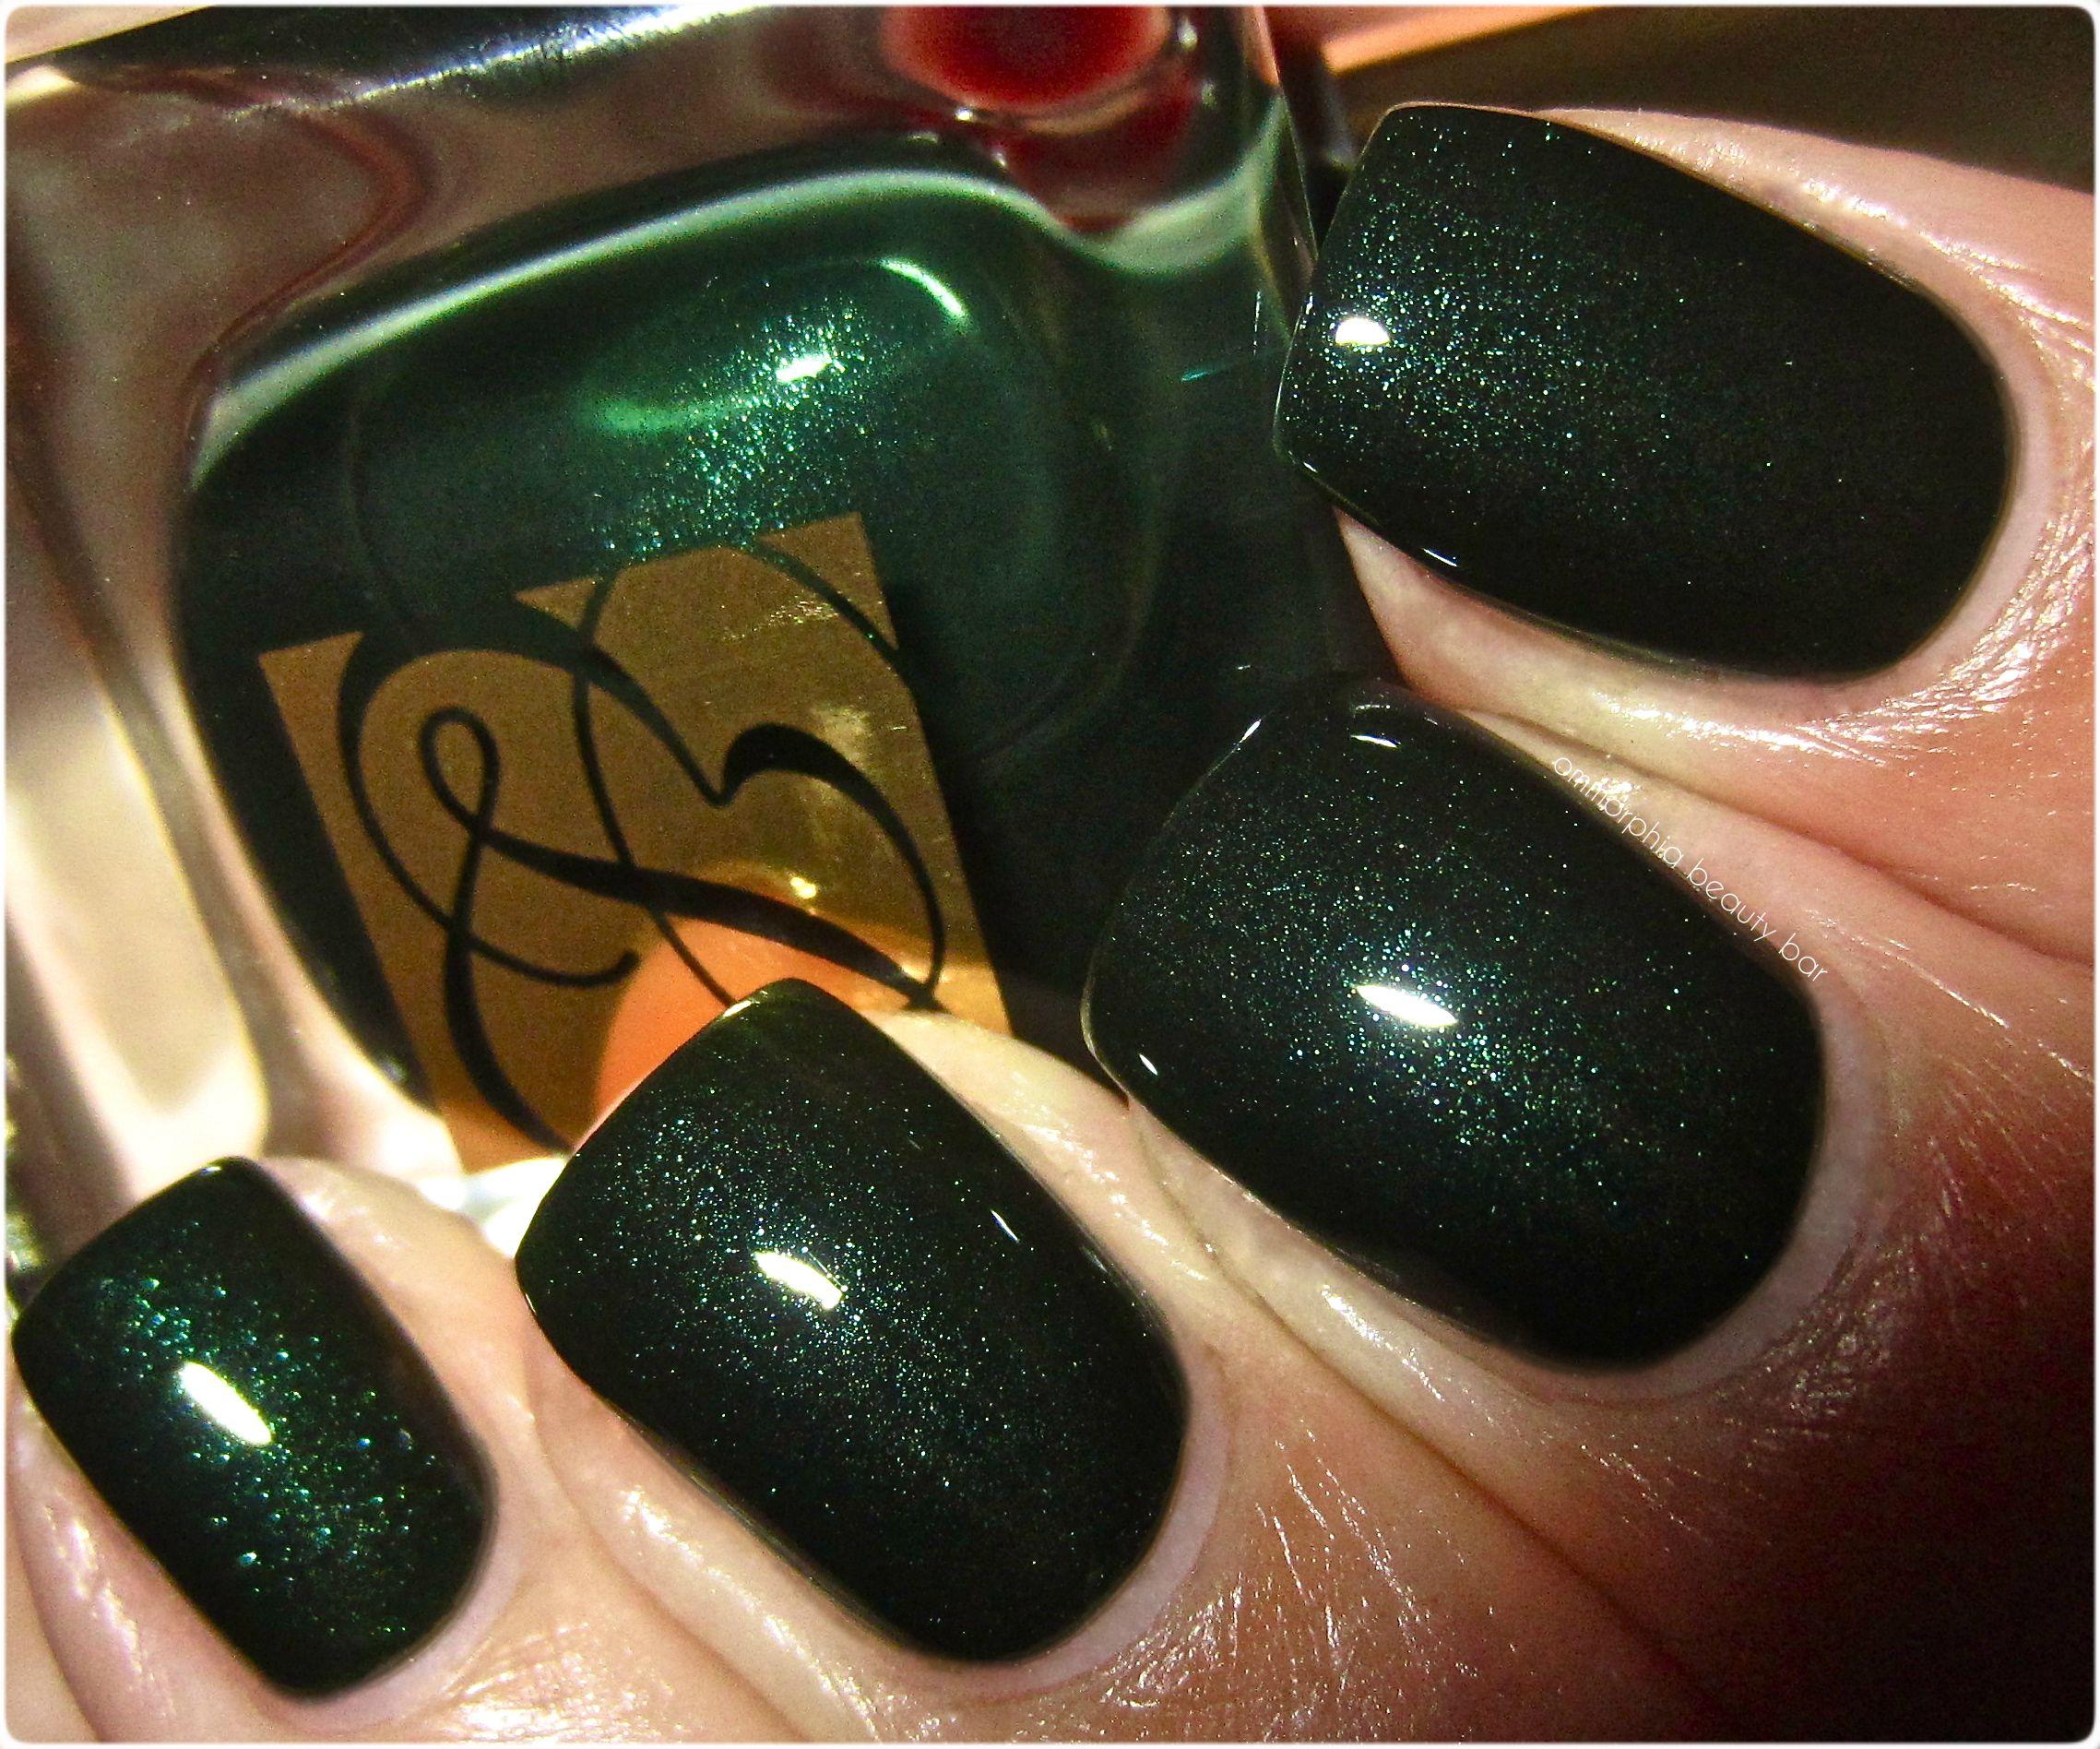 Estee Lauder Viper | Nail polish | Pinterest | Estee lauder